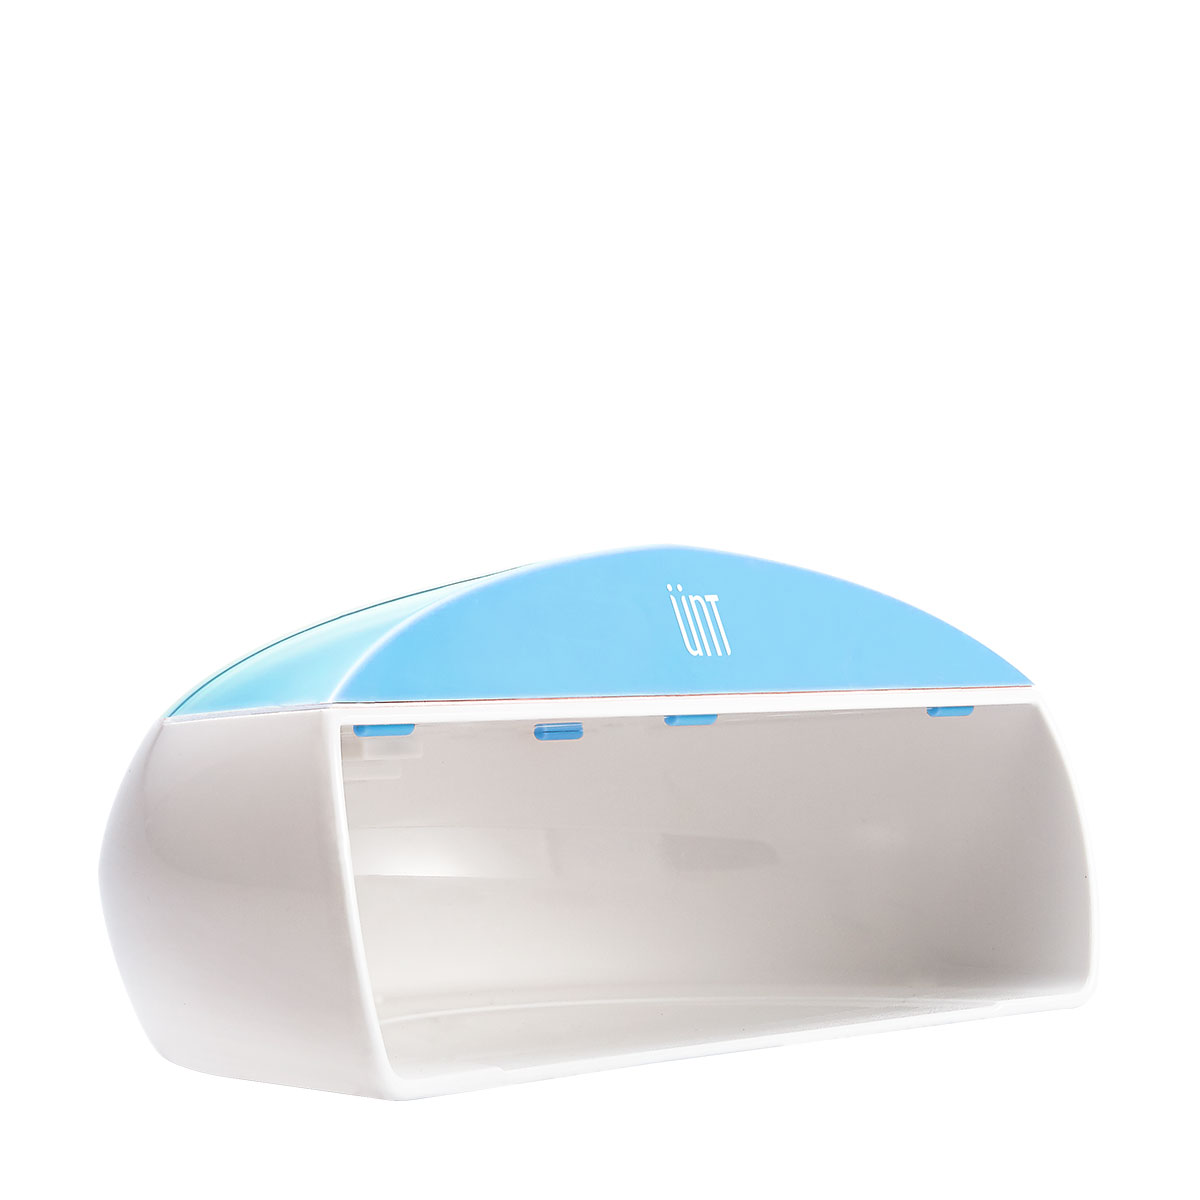 LED美甲光撩燈 (藍)